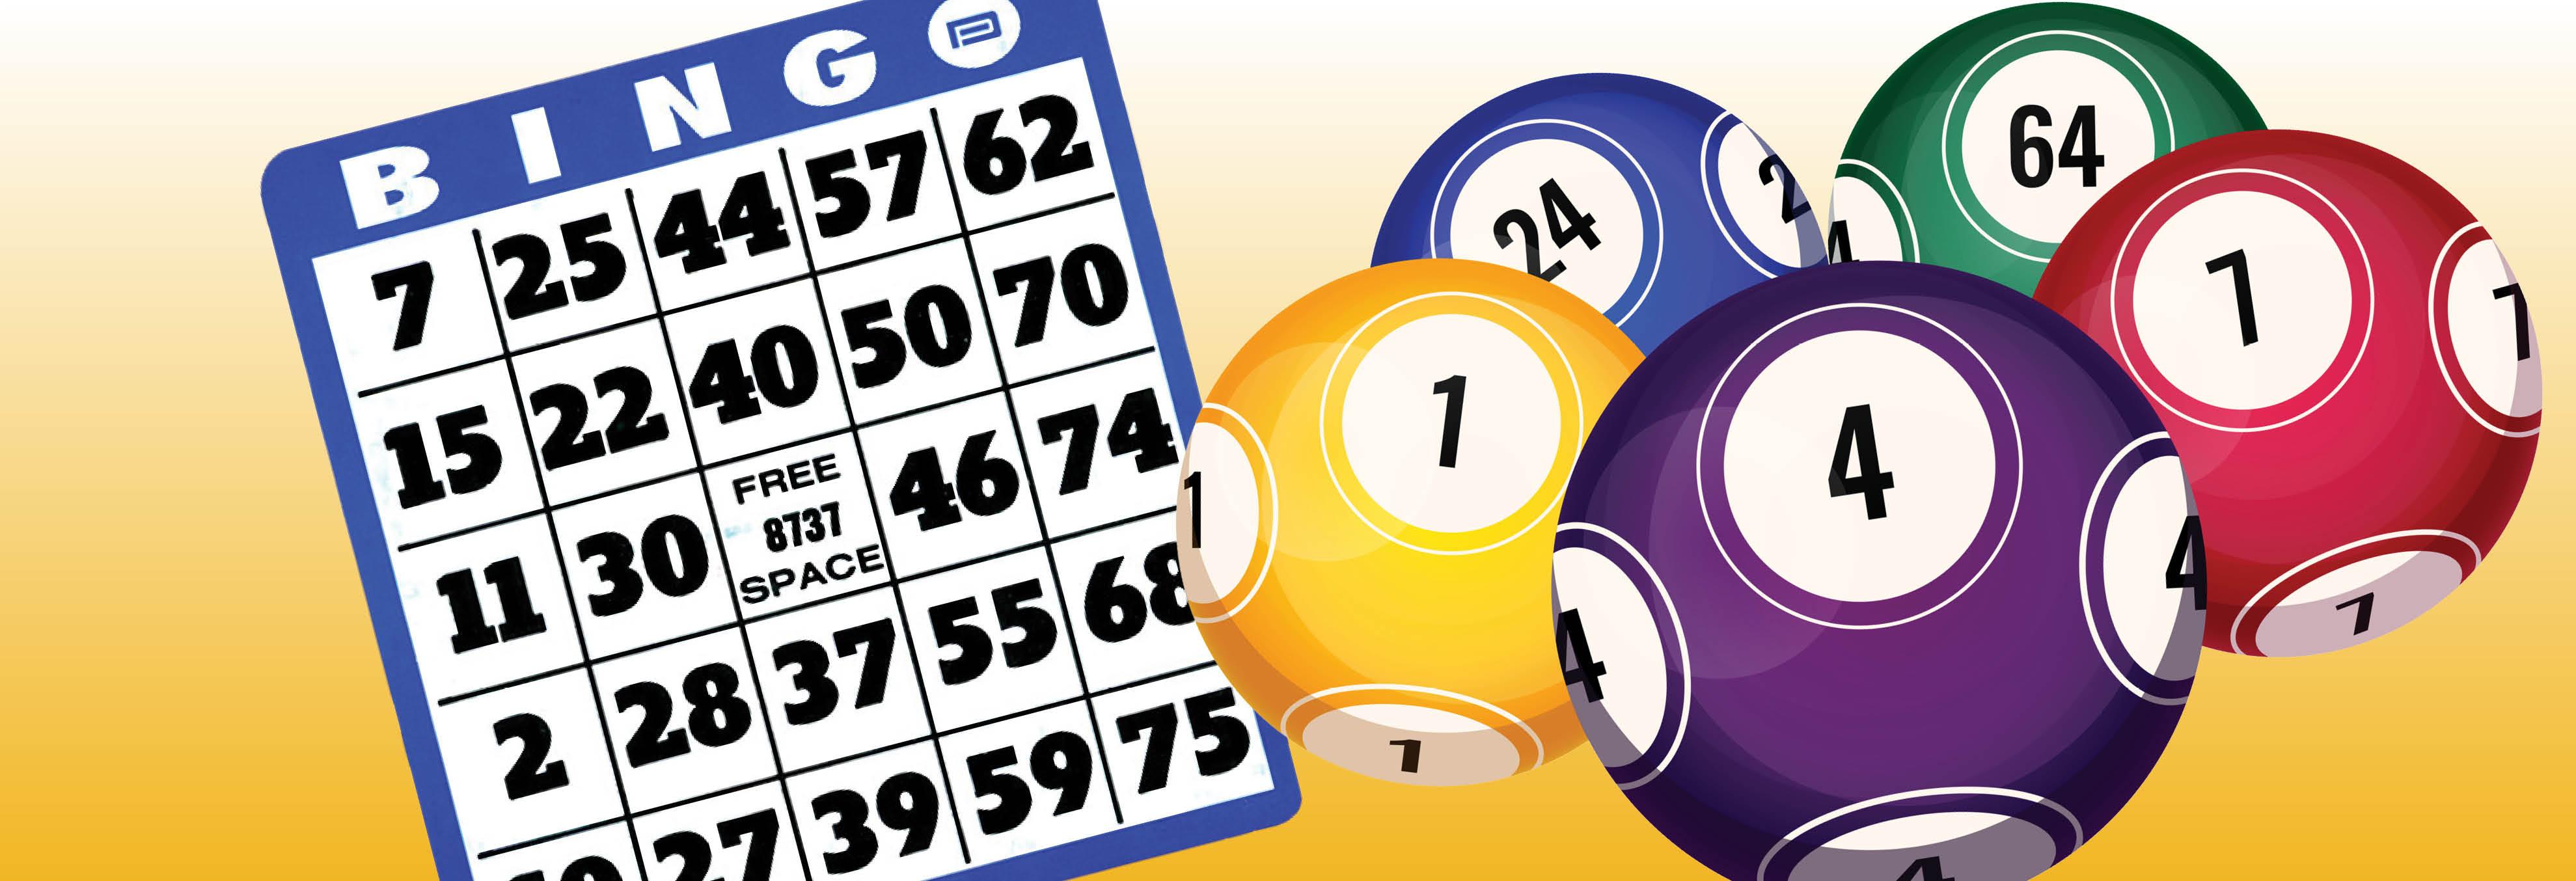 Knights of Columbus, bingo, jackpot, food specials, payouts, waynesboro